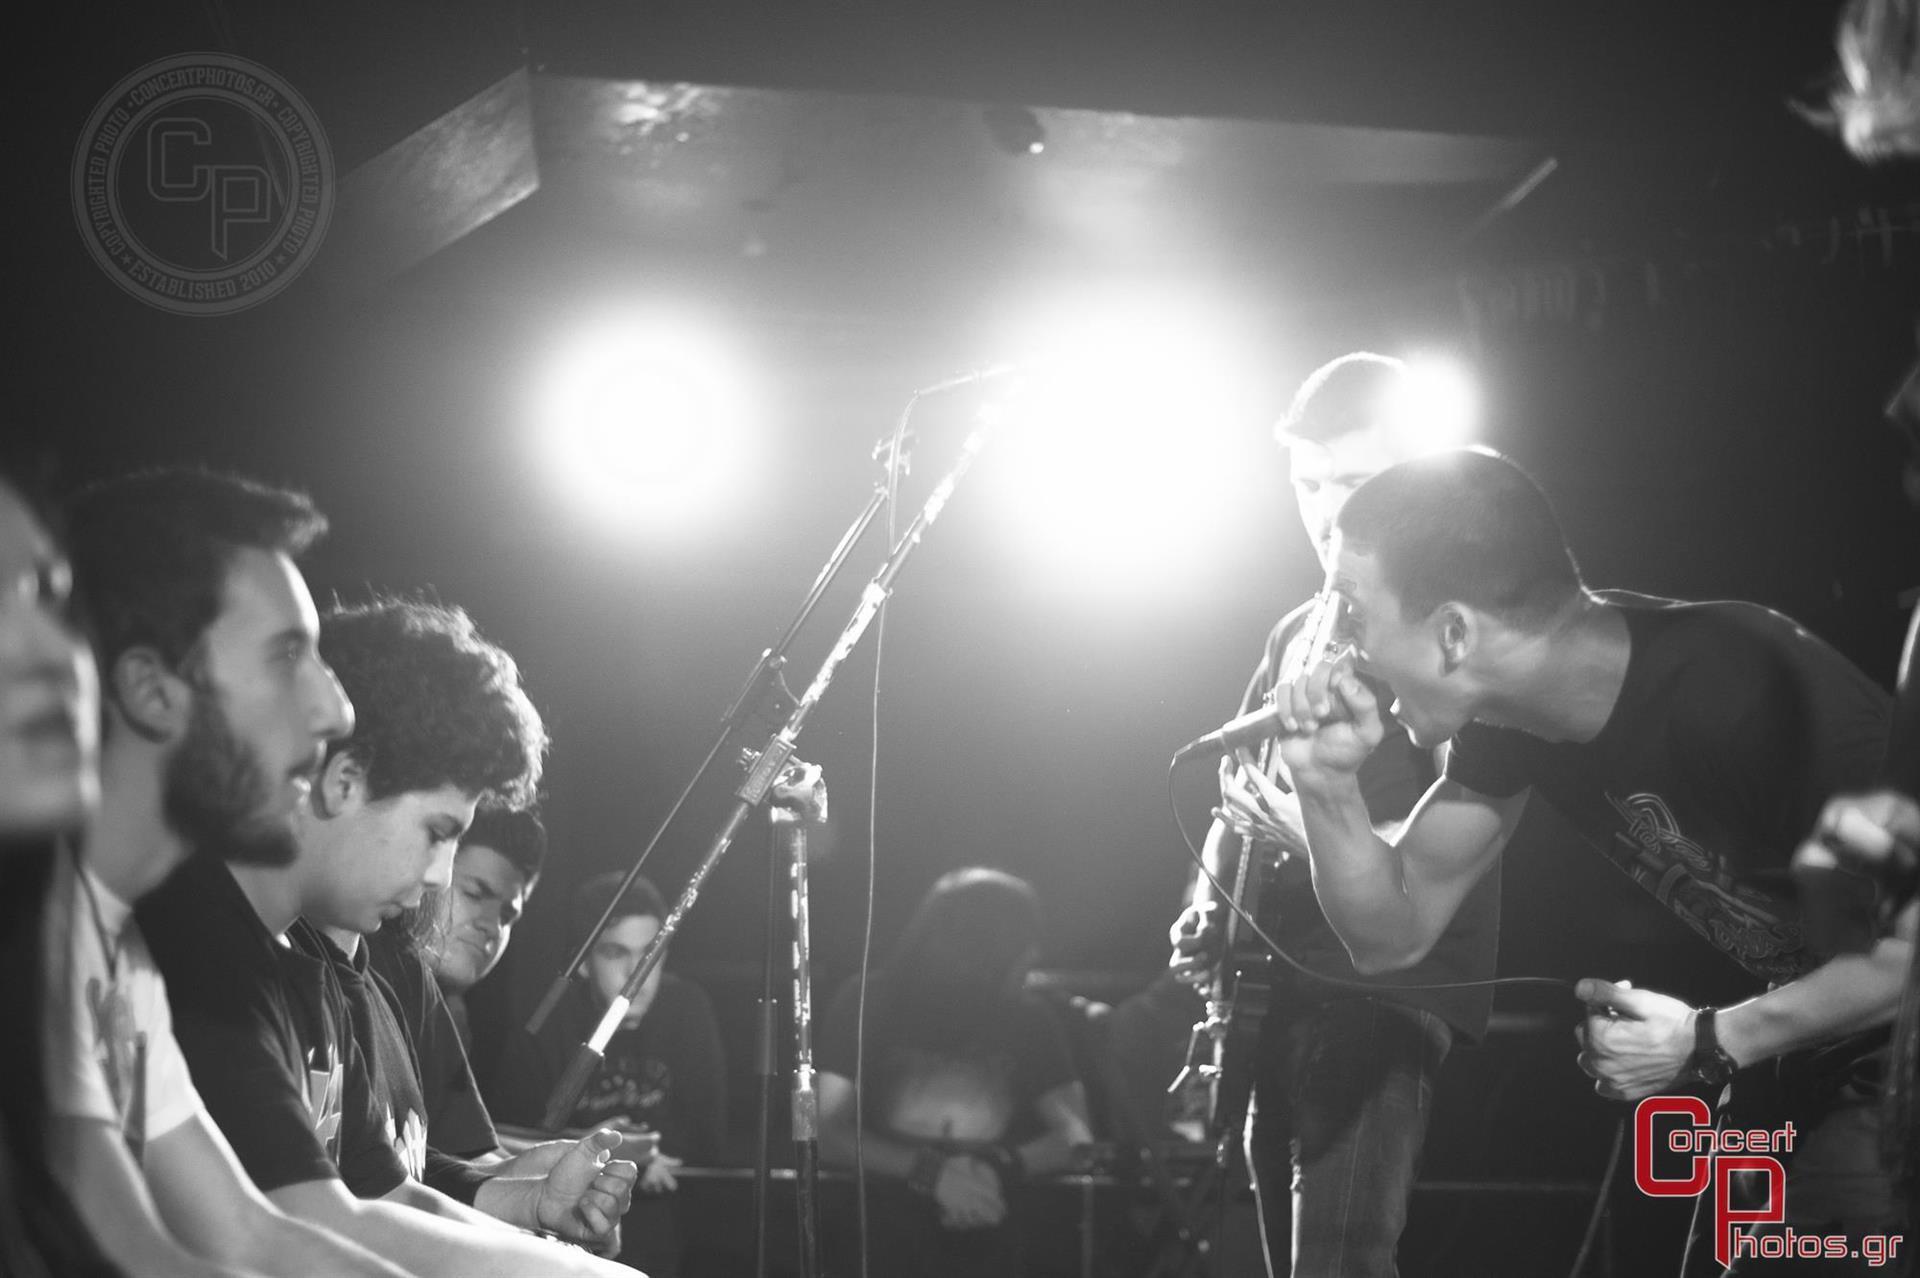 Battle Of The Bands Athens - Leg 3- photographer:  - ConcertPhotos - 20150104_2102_02